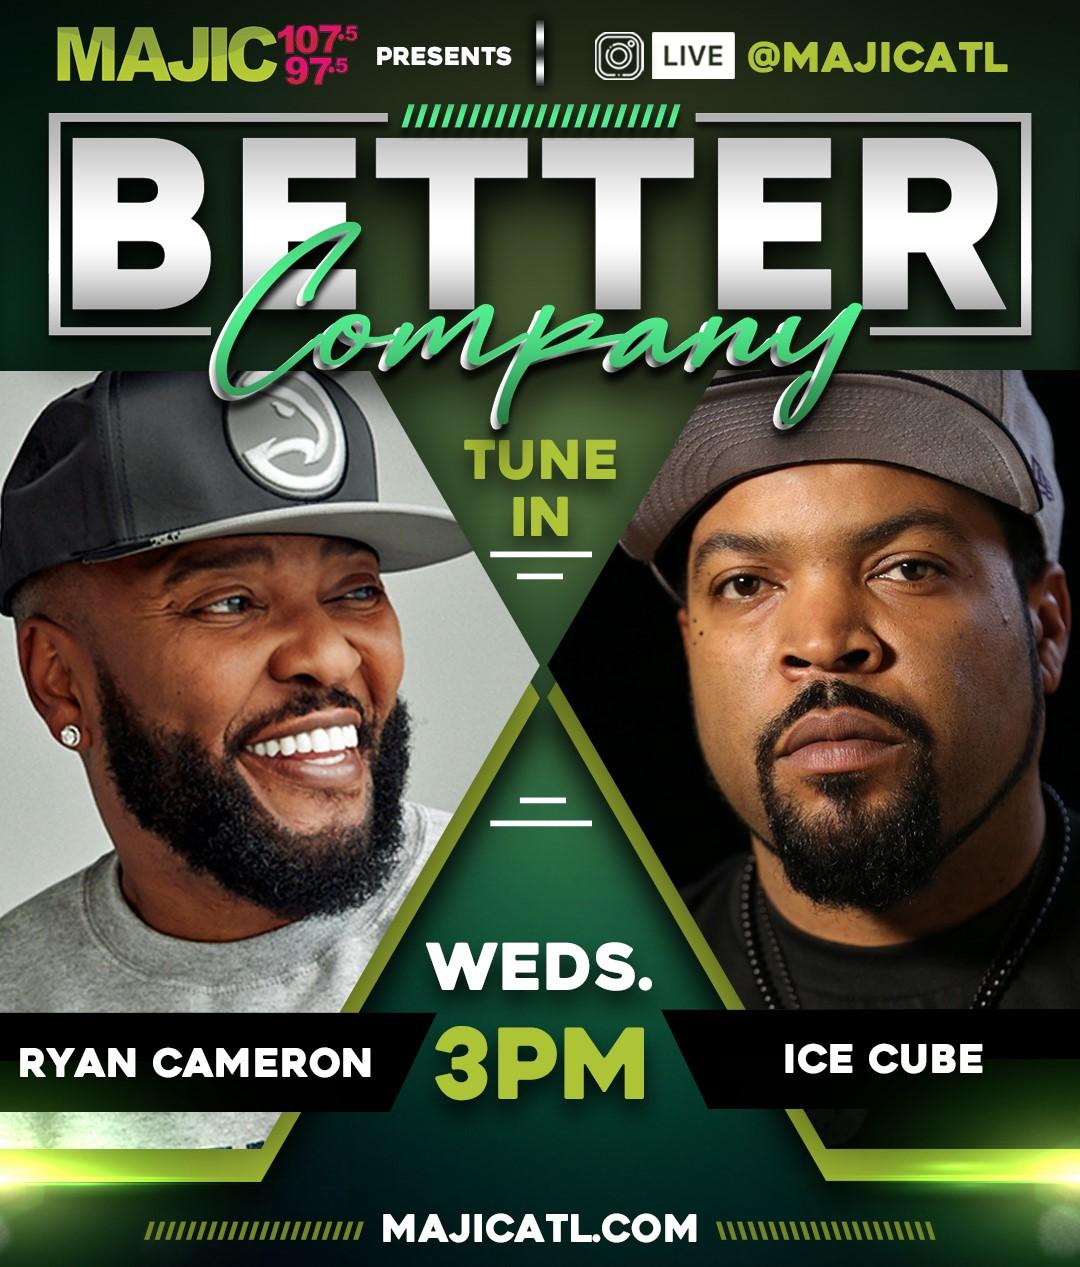 Ice Cube with Ryan Cameron